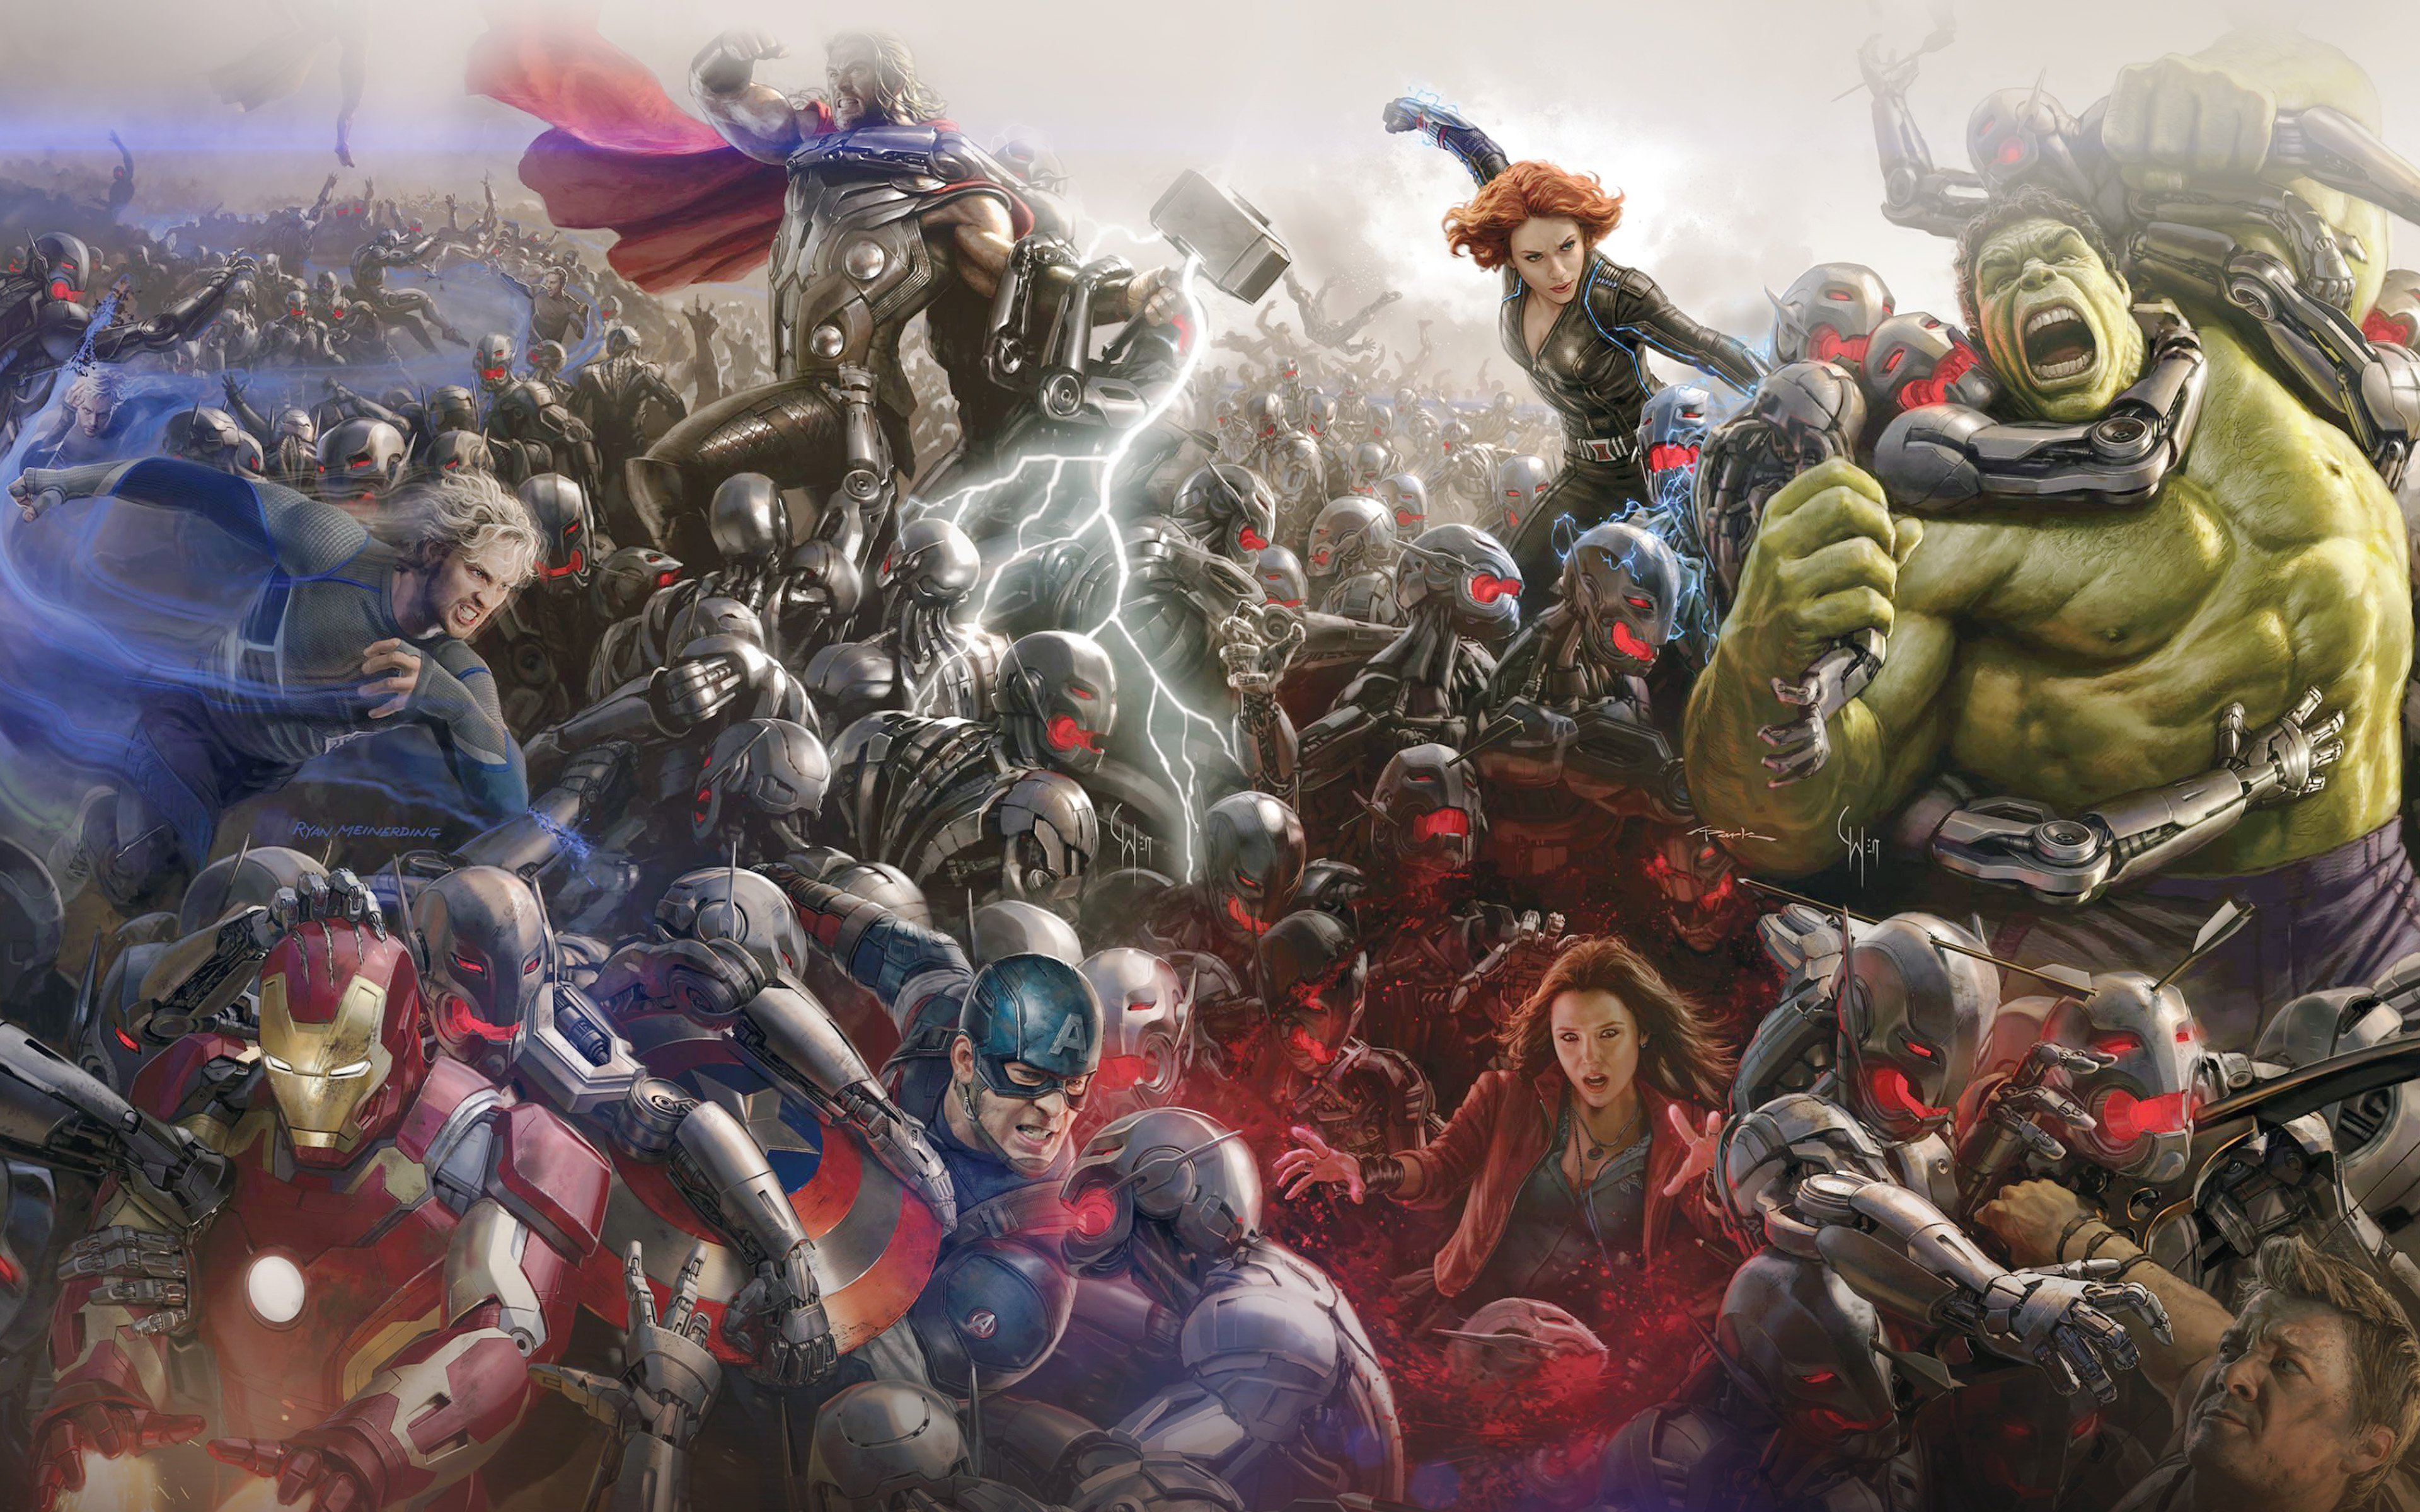 Avengers Age of Ultron 4K UHD